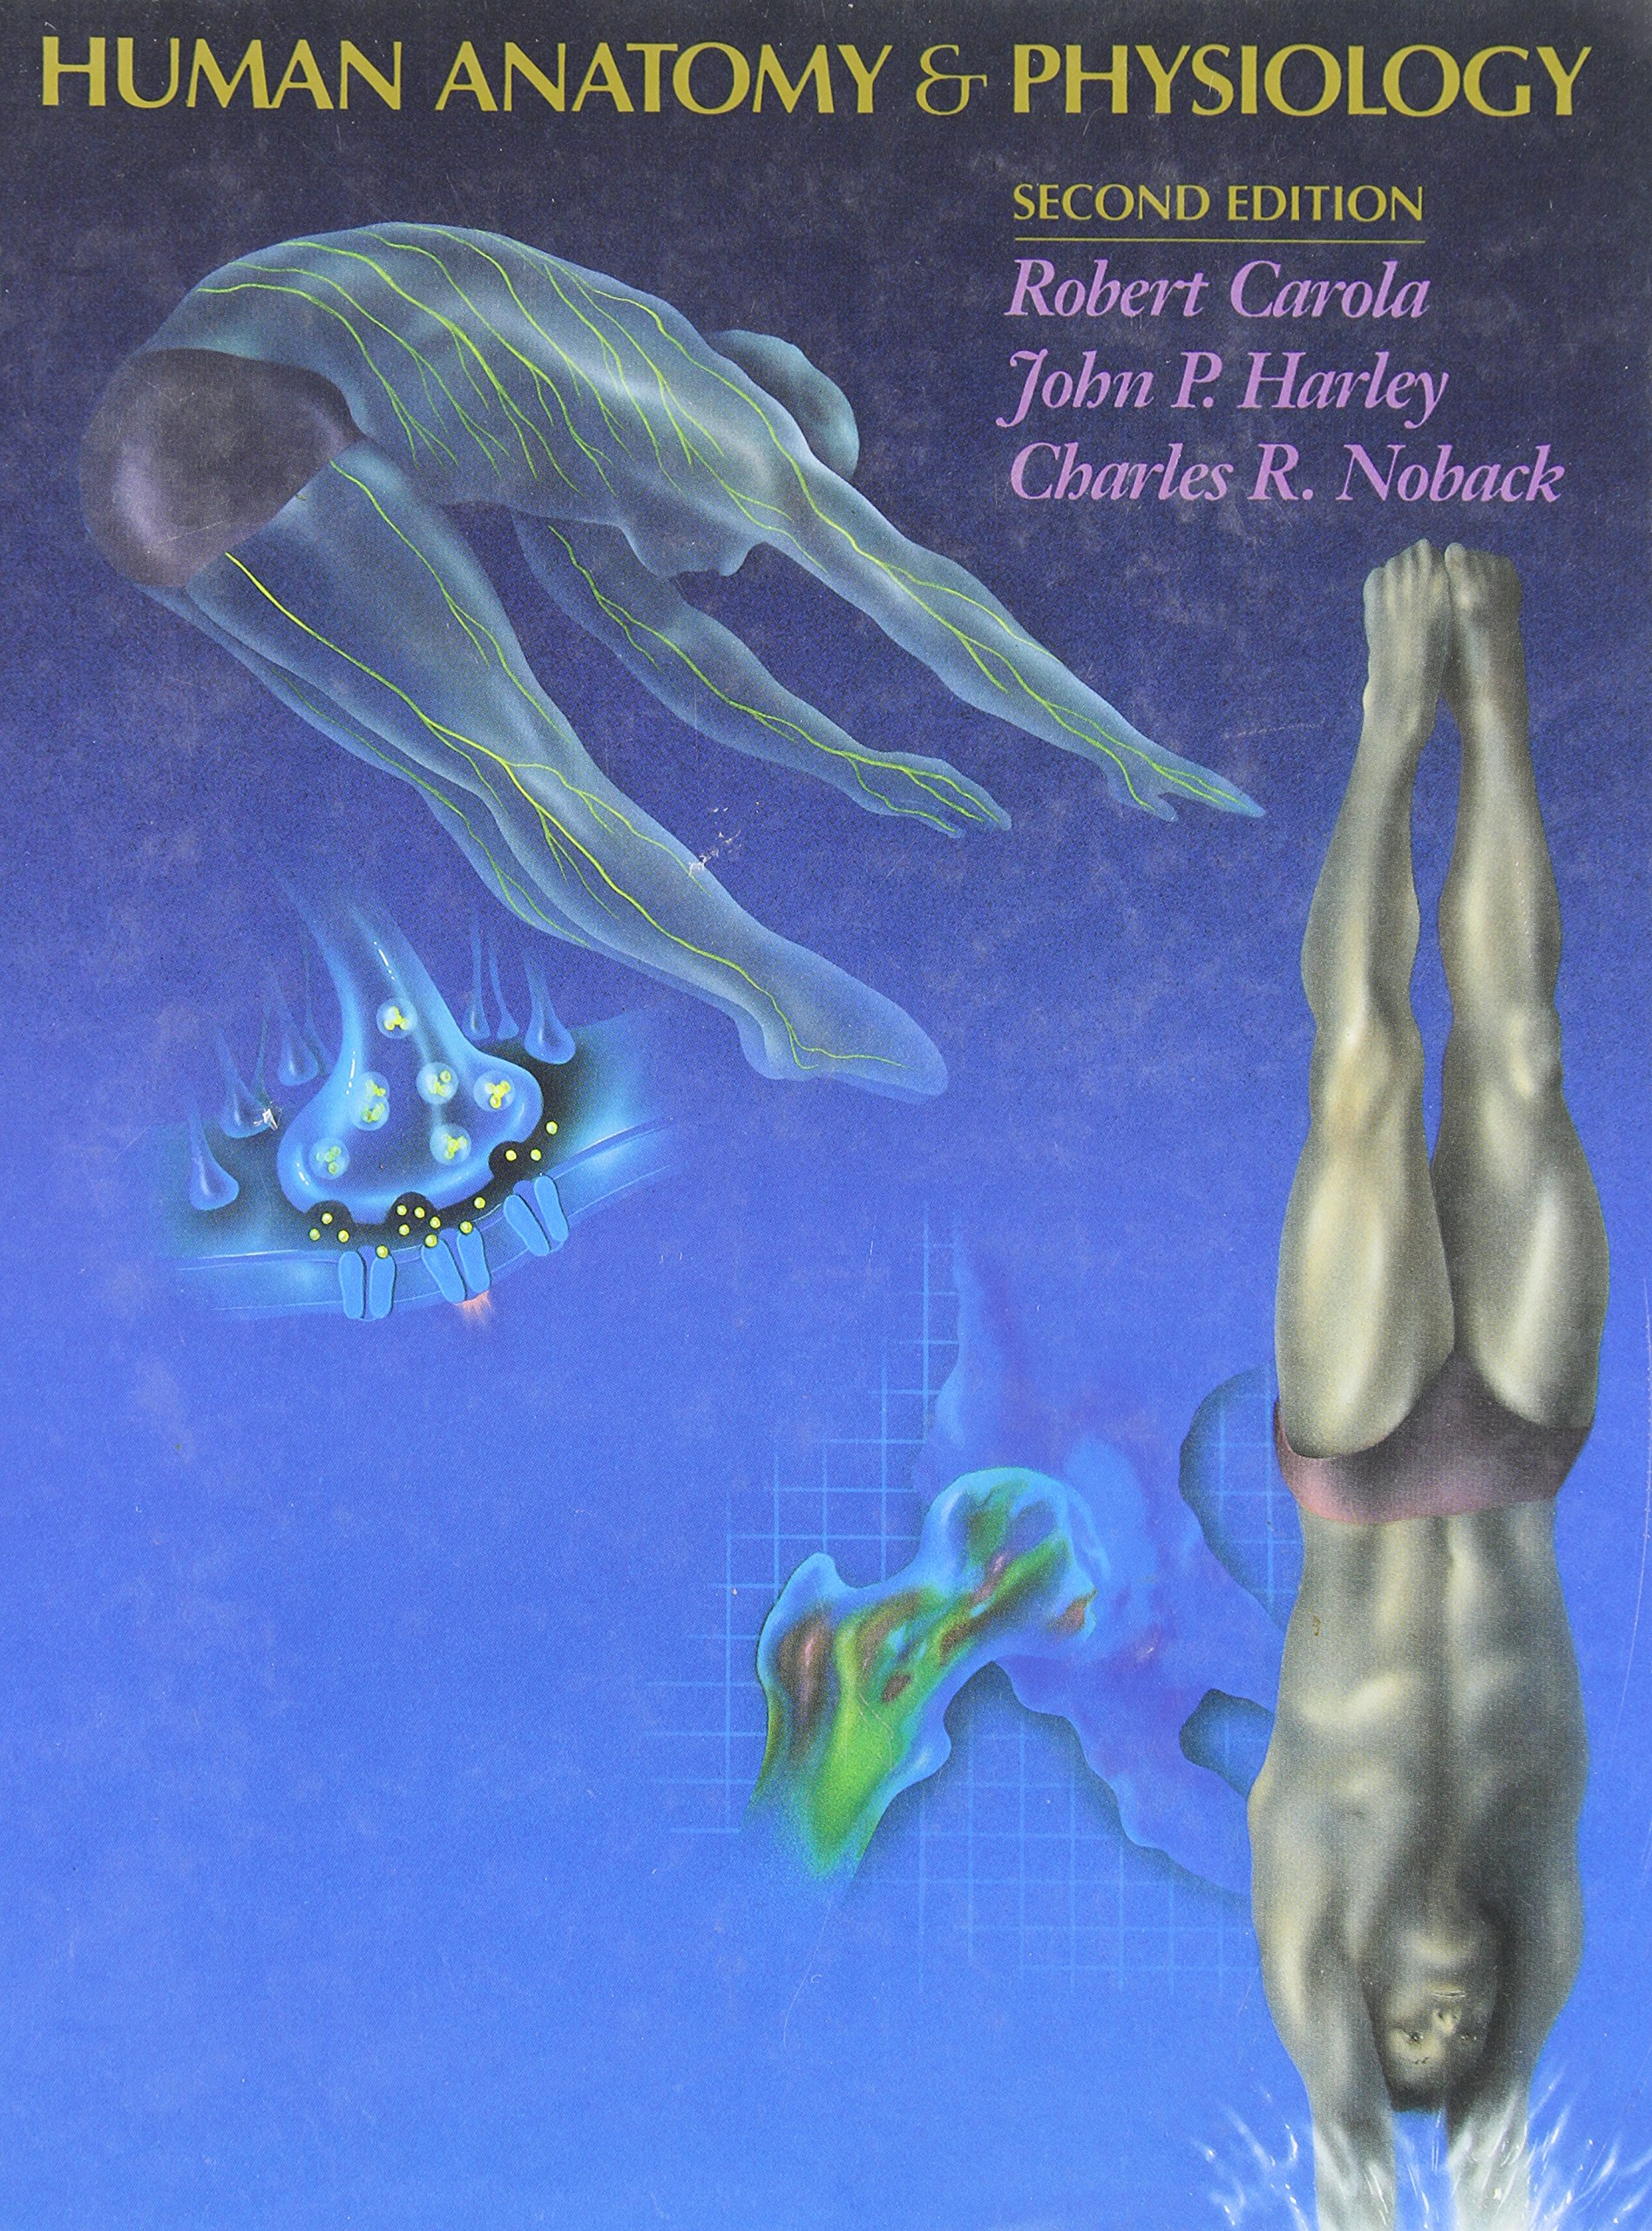 Human Anatomy and Physiology: Amazon.es: Robert Carola, John P ...